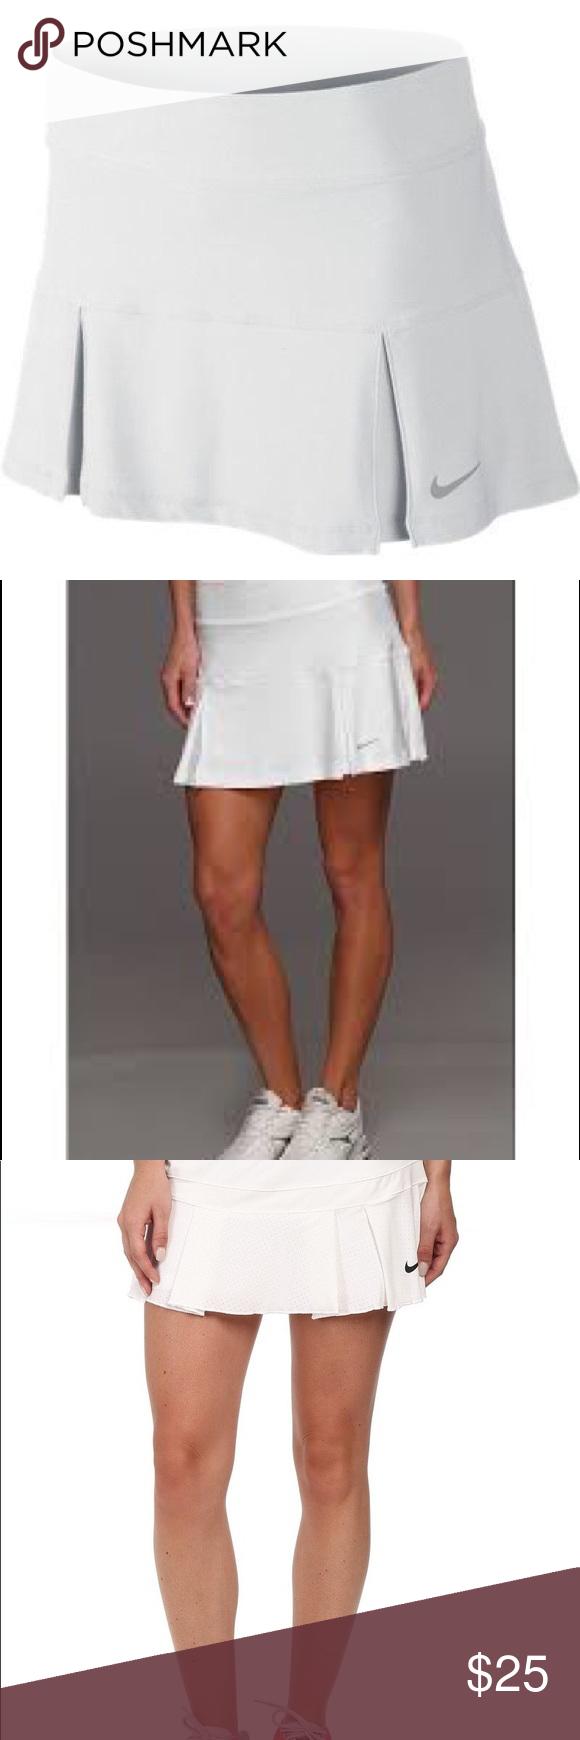 Nike Power Pleated Tennis Skirt Xs Pleated Tennis Skirt Tennis Skirt Nike Skirts